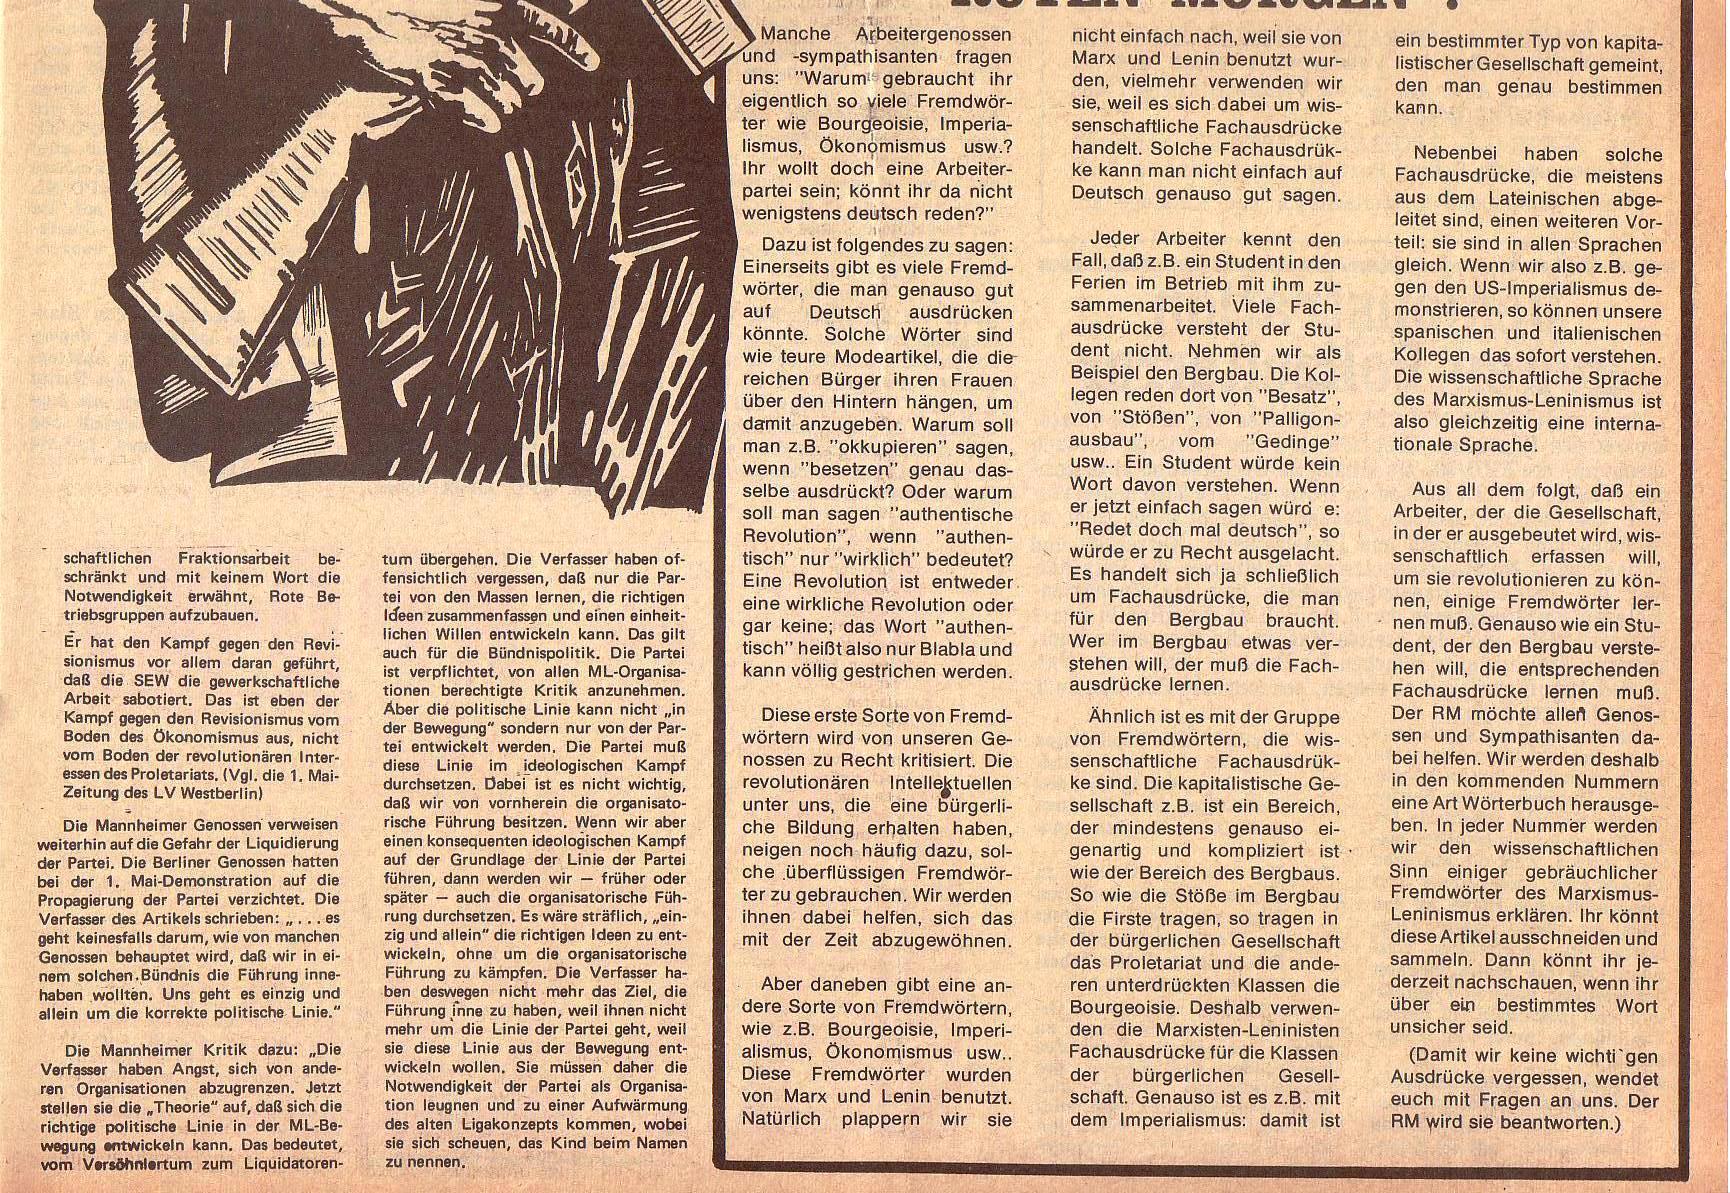 Roter Morgen, 5. Jg., 13. September 1971, Nr. 9, Seite 7b